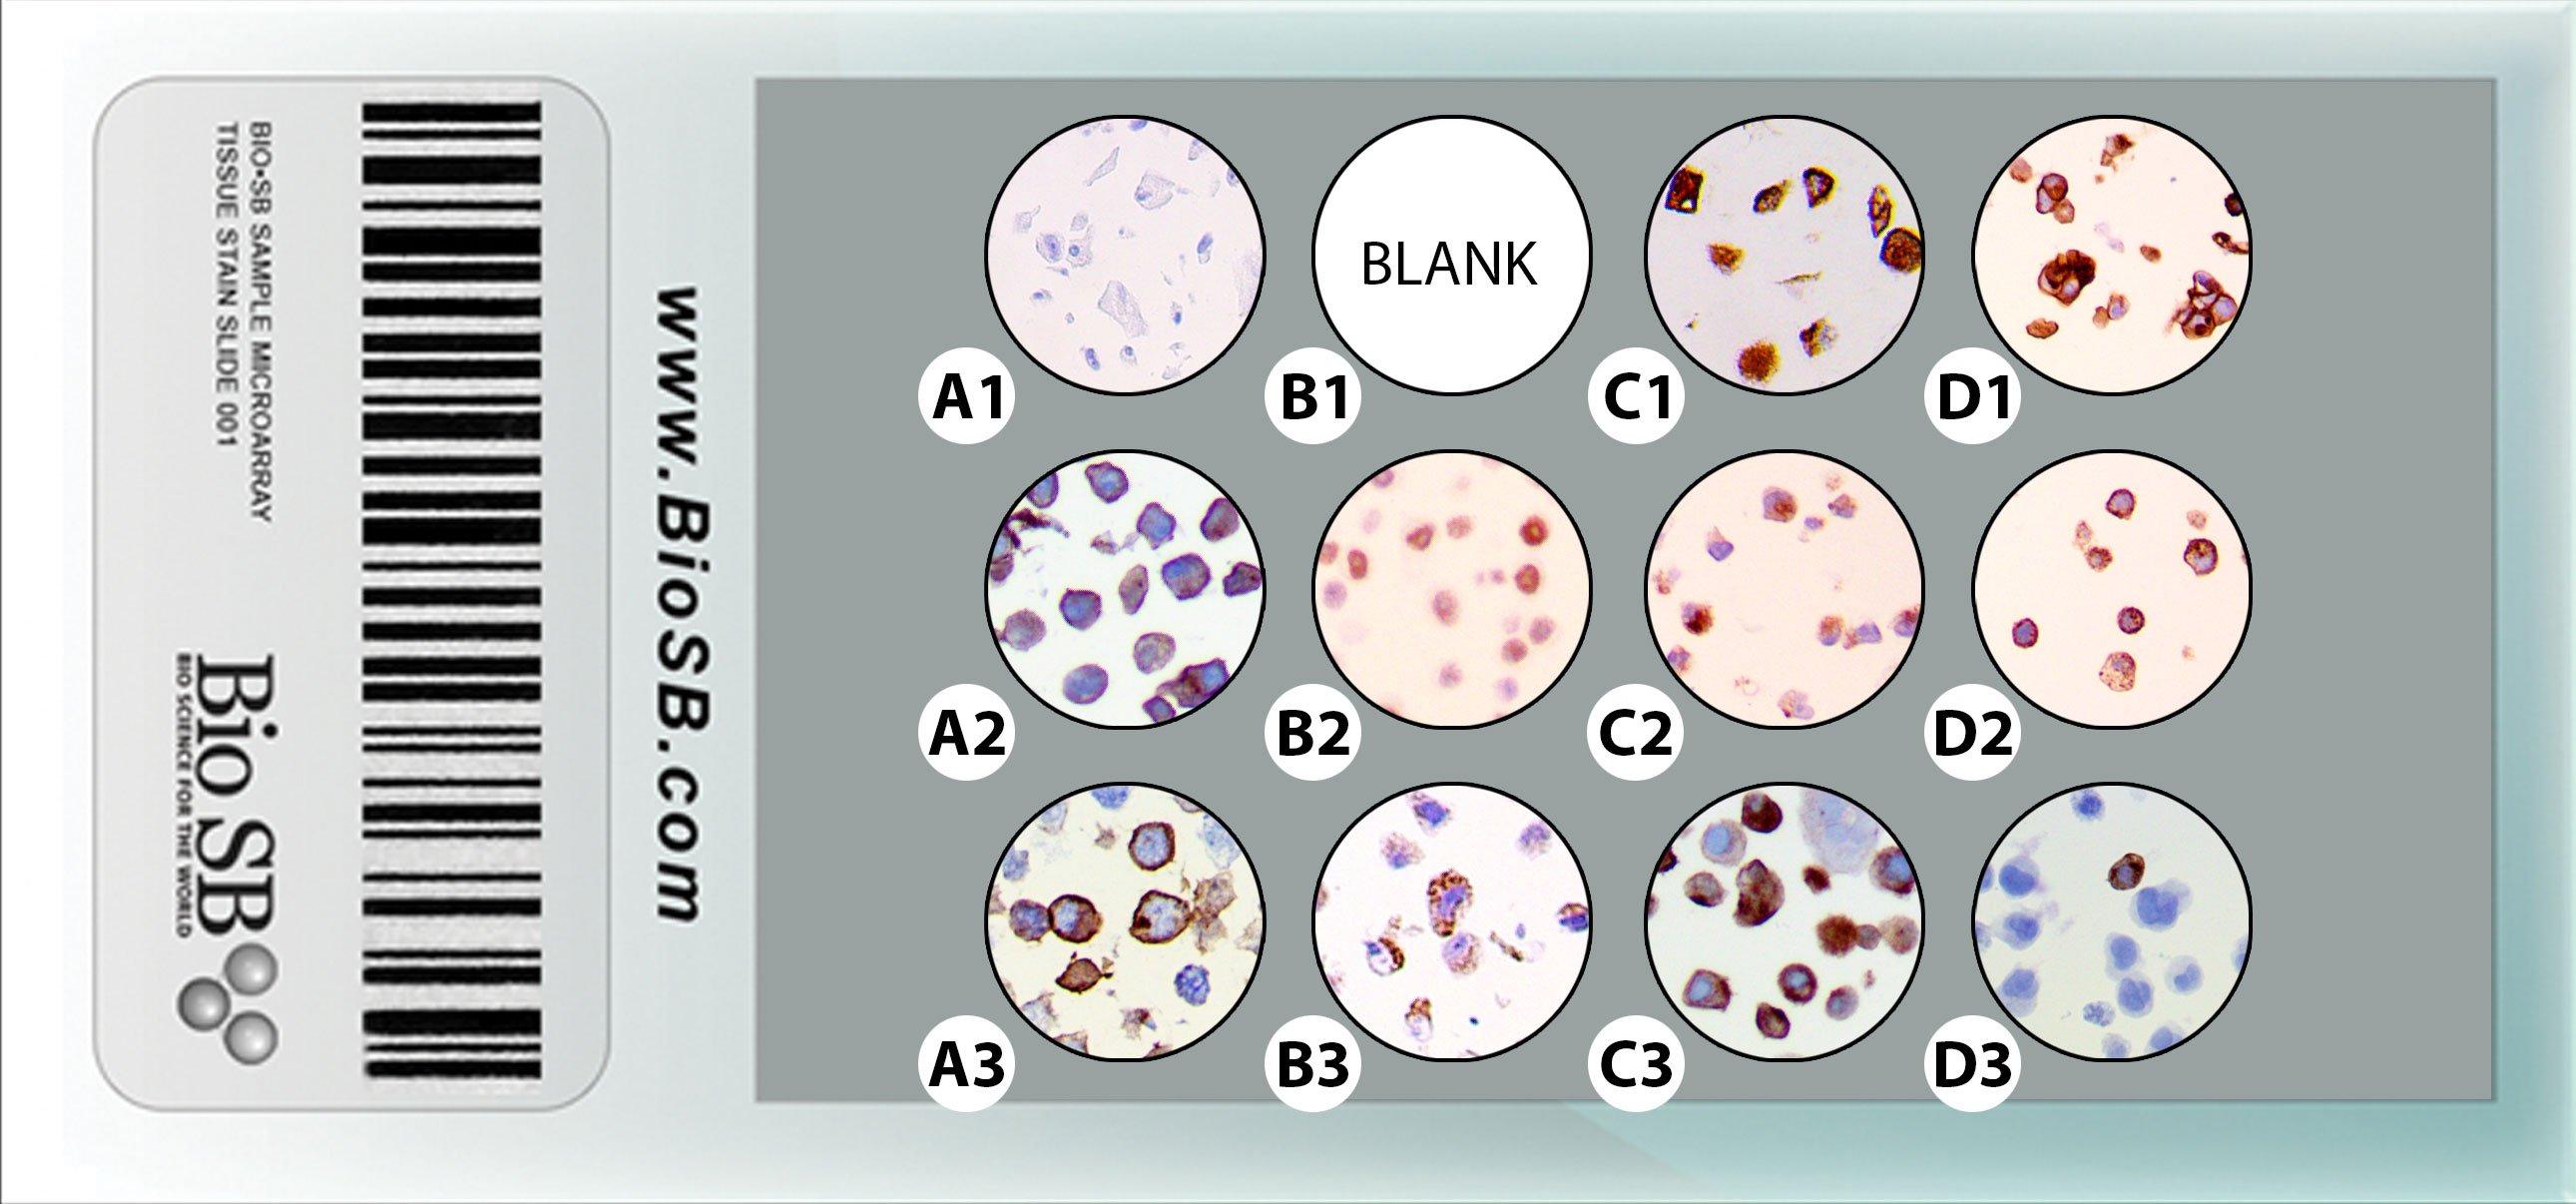 Cancer Human Cell Line Microarrays Bio Sb